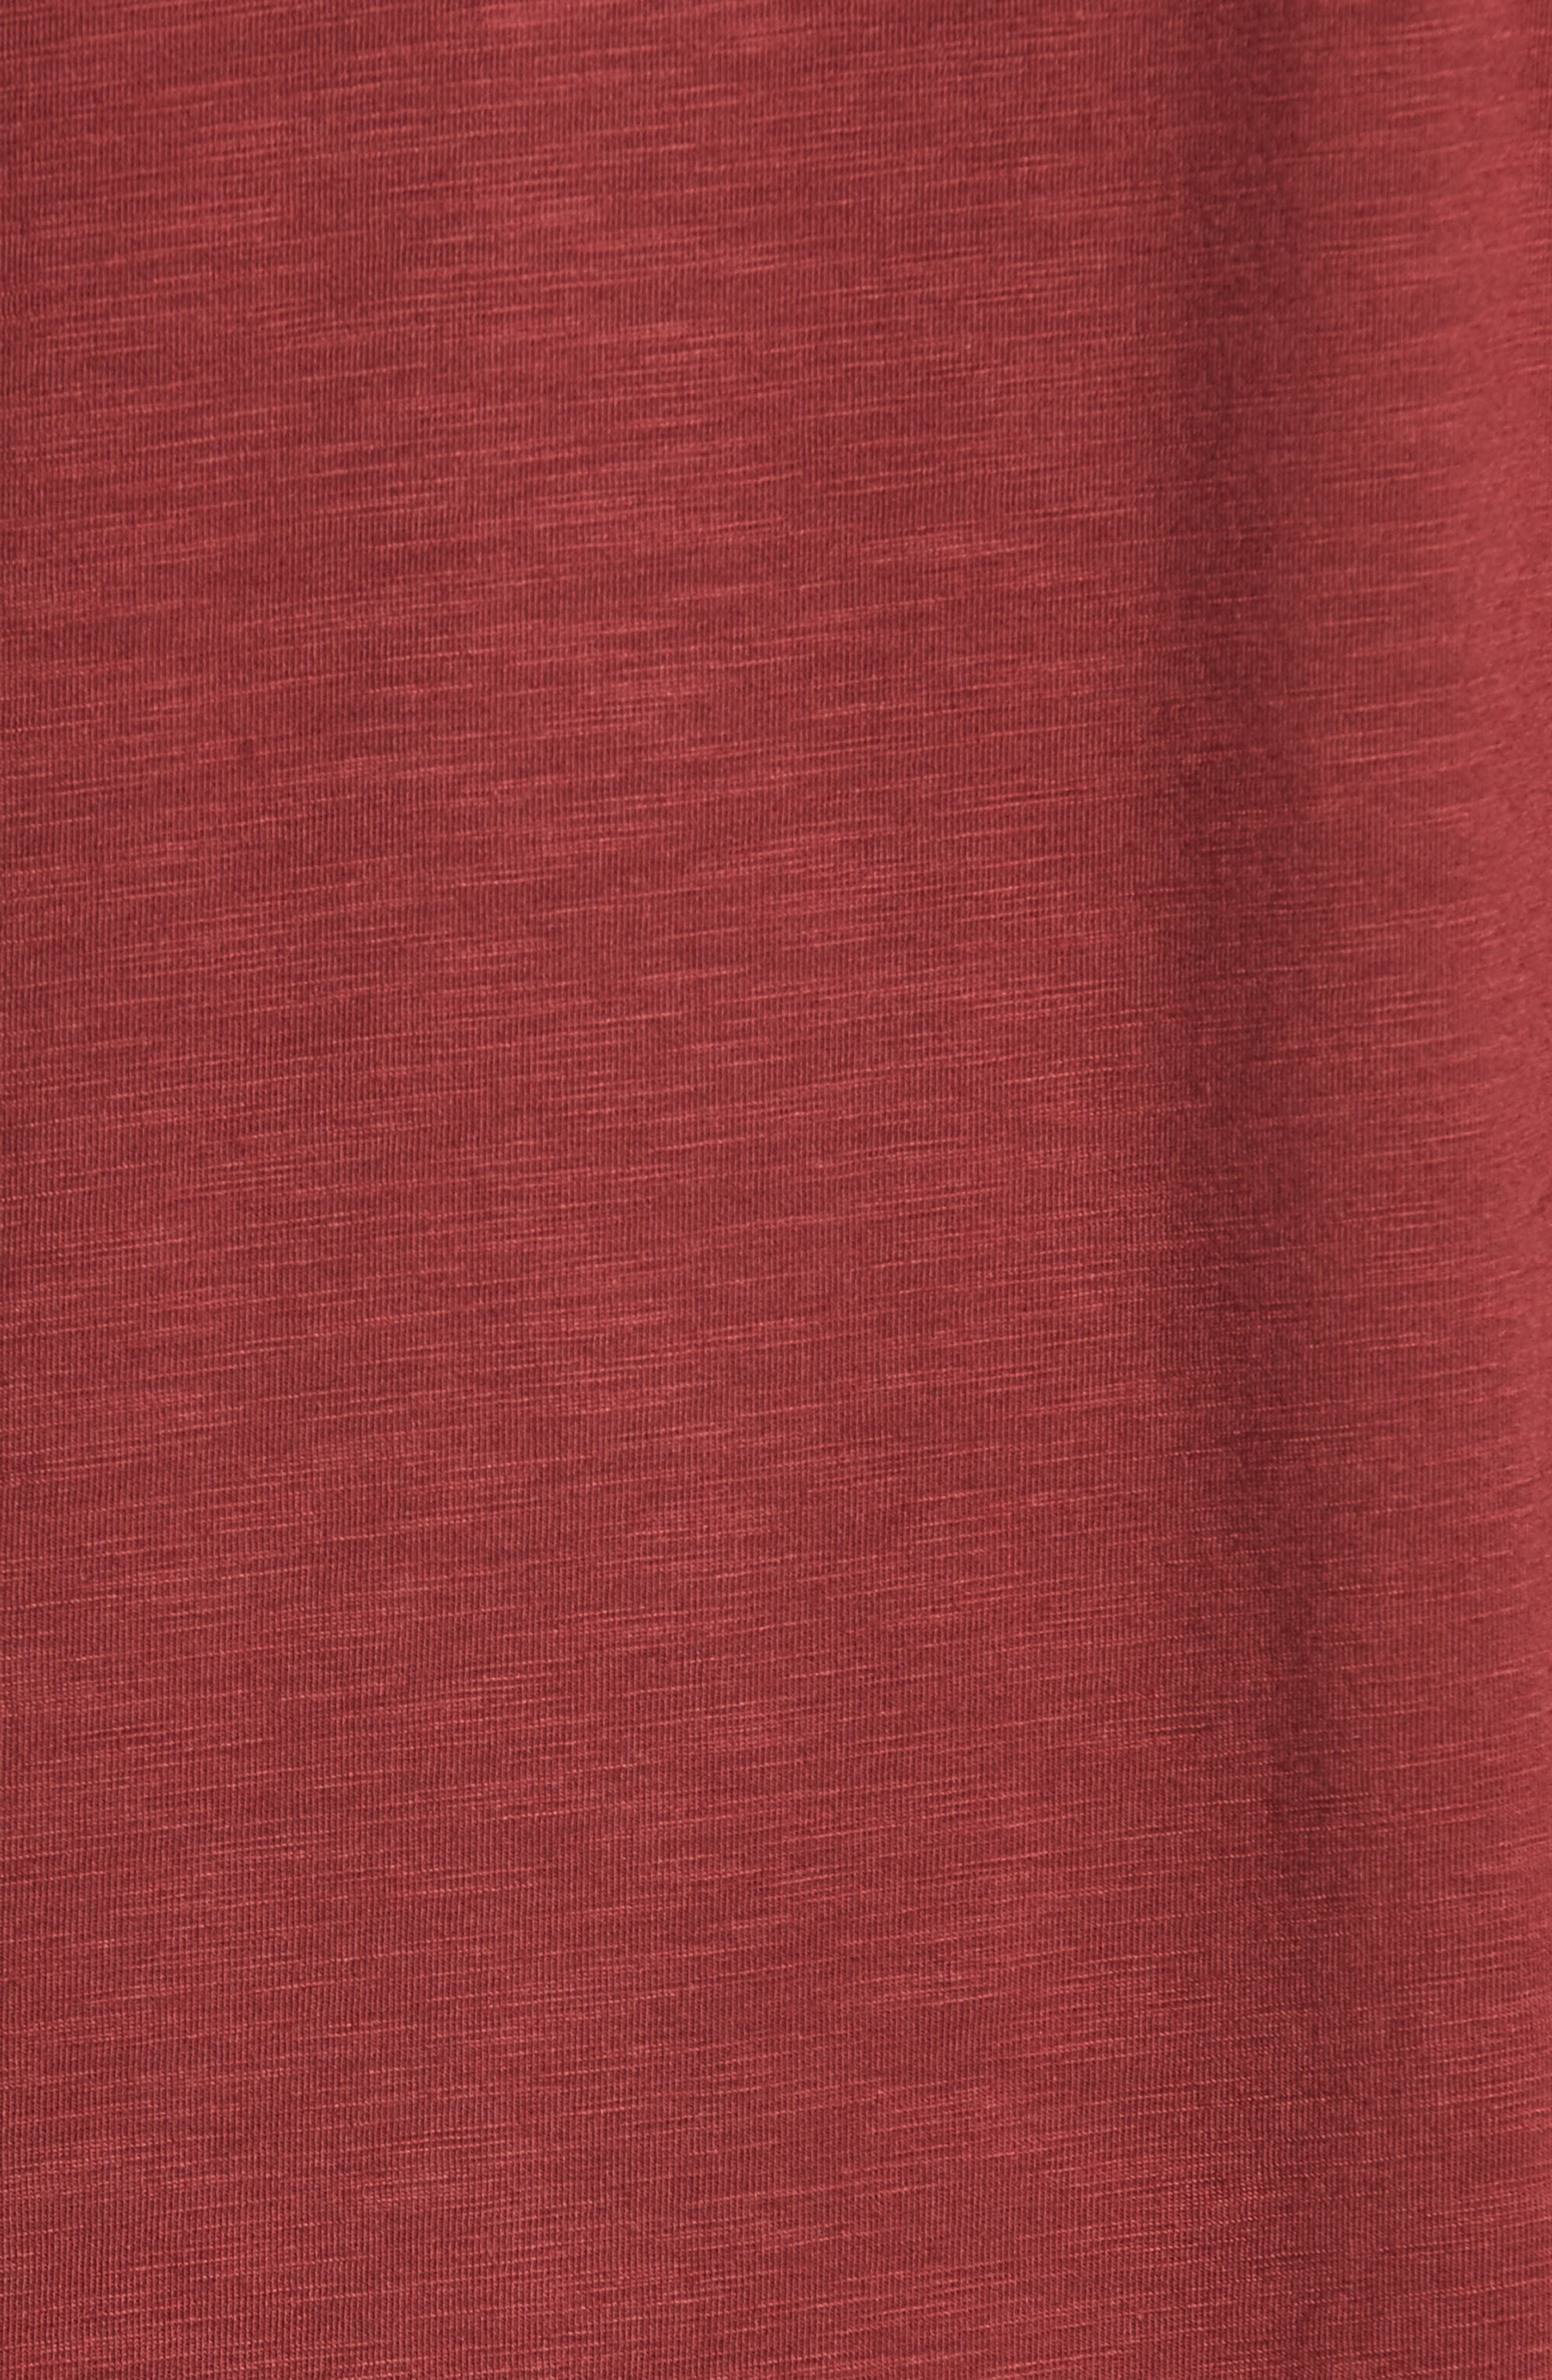 'Trumbull' Trim Fit Slubbed T-Shirt,                             Alternate thumbnail 5, color,                             Oxblood